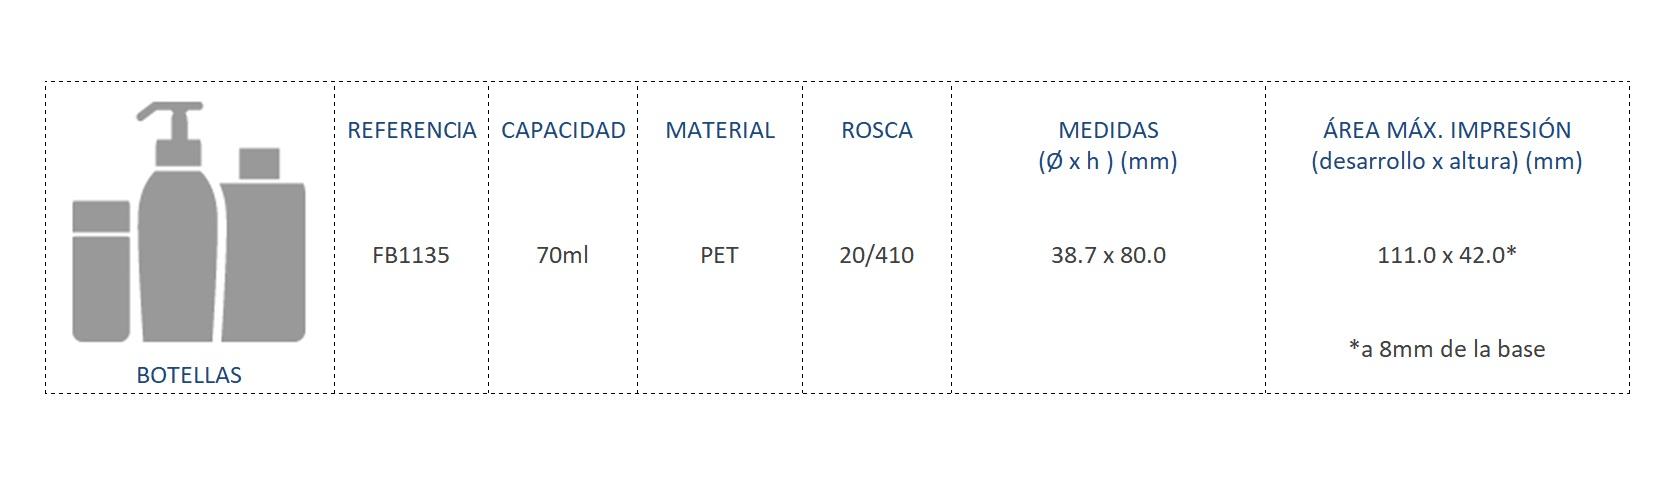 Cuadro de materiales FB1135